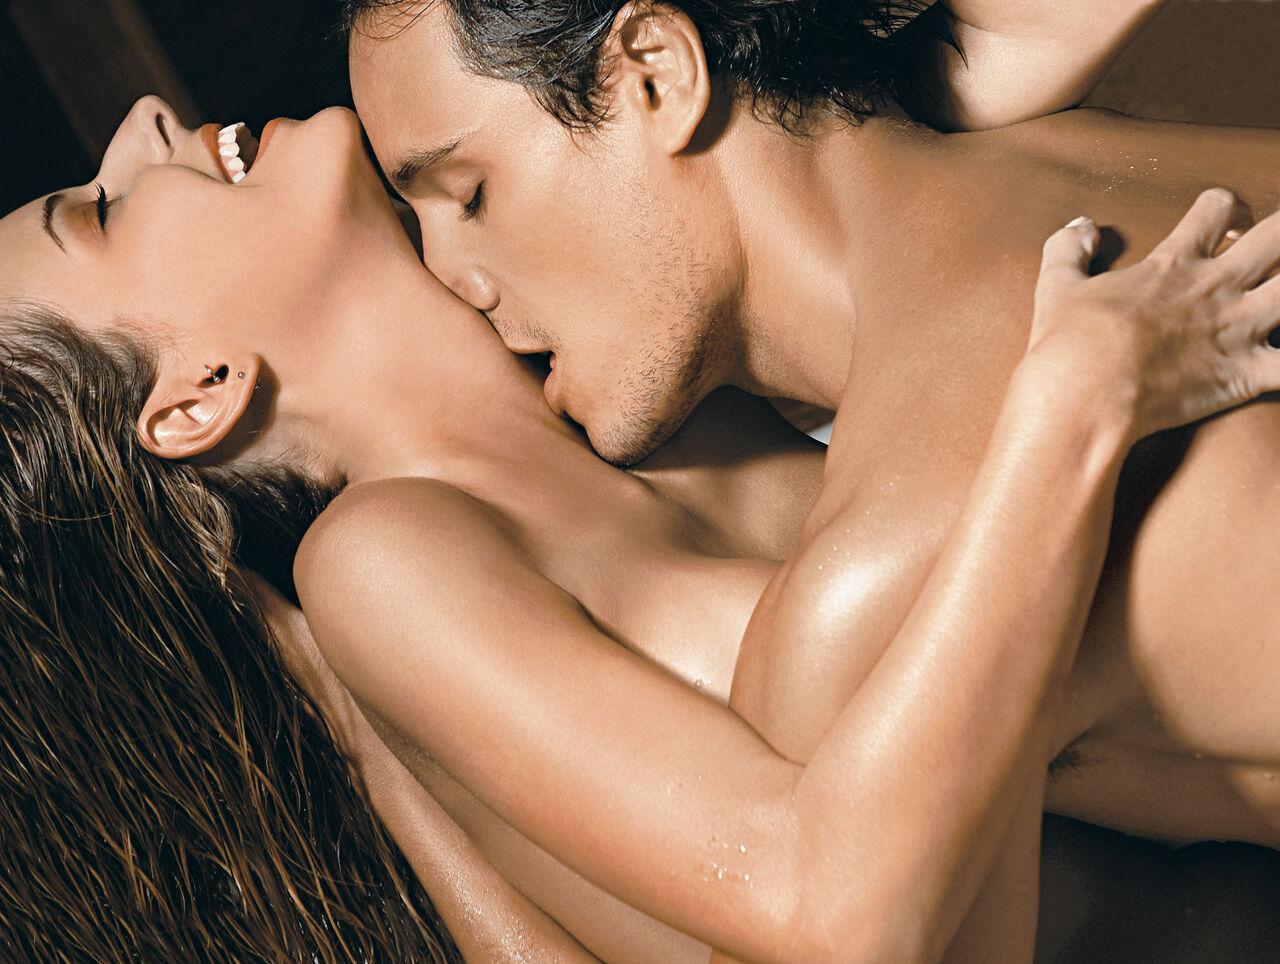 Секс среди взрослых картинки